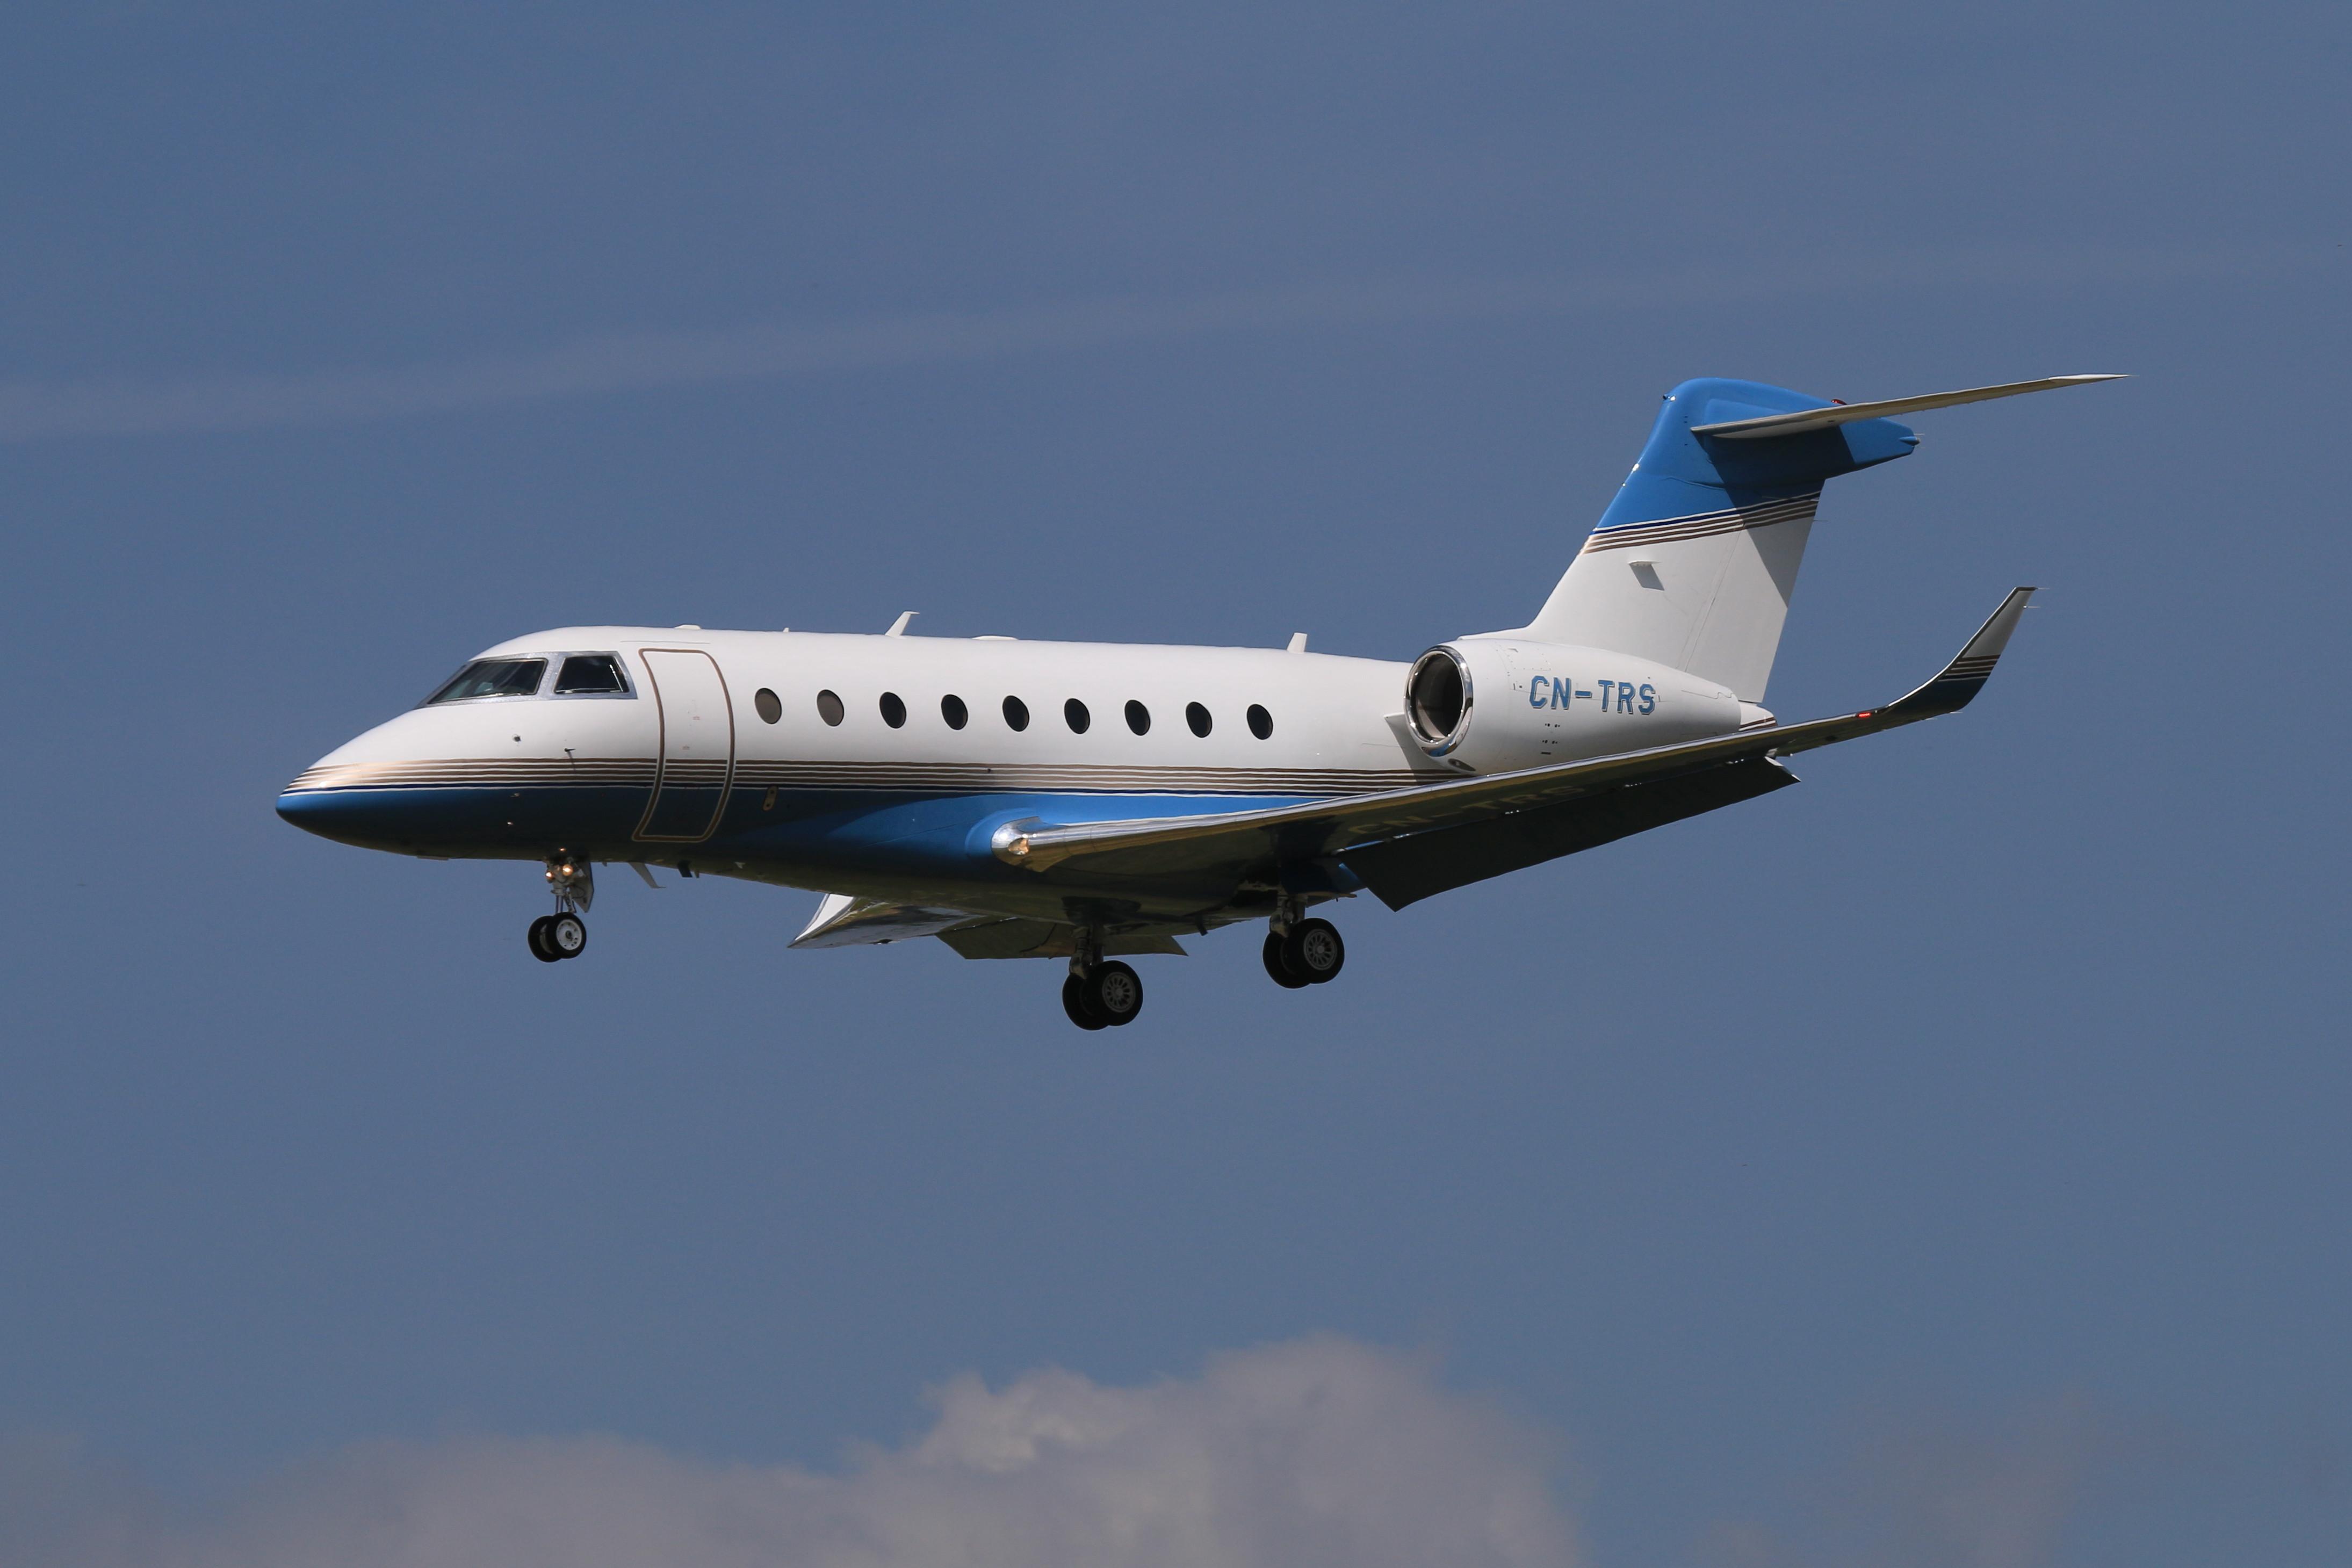 Photos des avions immatriculés au Maroc (CN) 18265143601_ebb73ae9ff_o